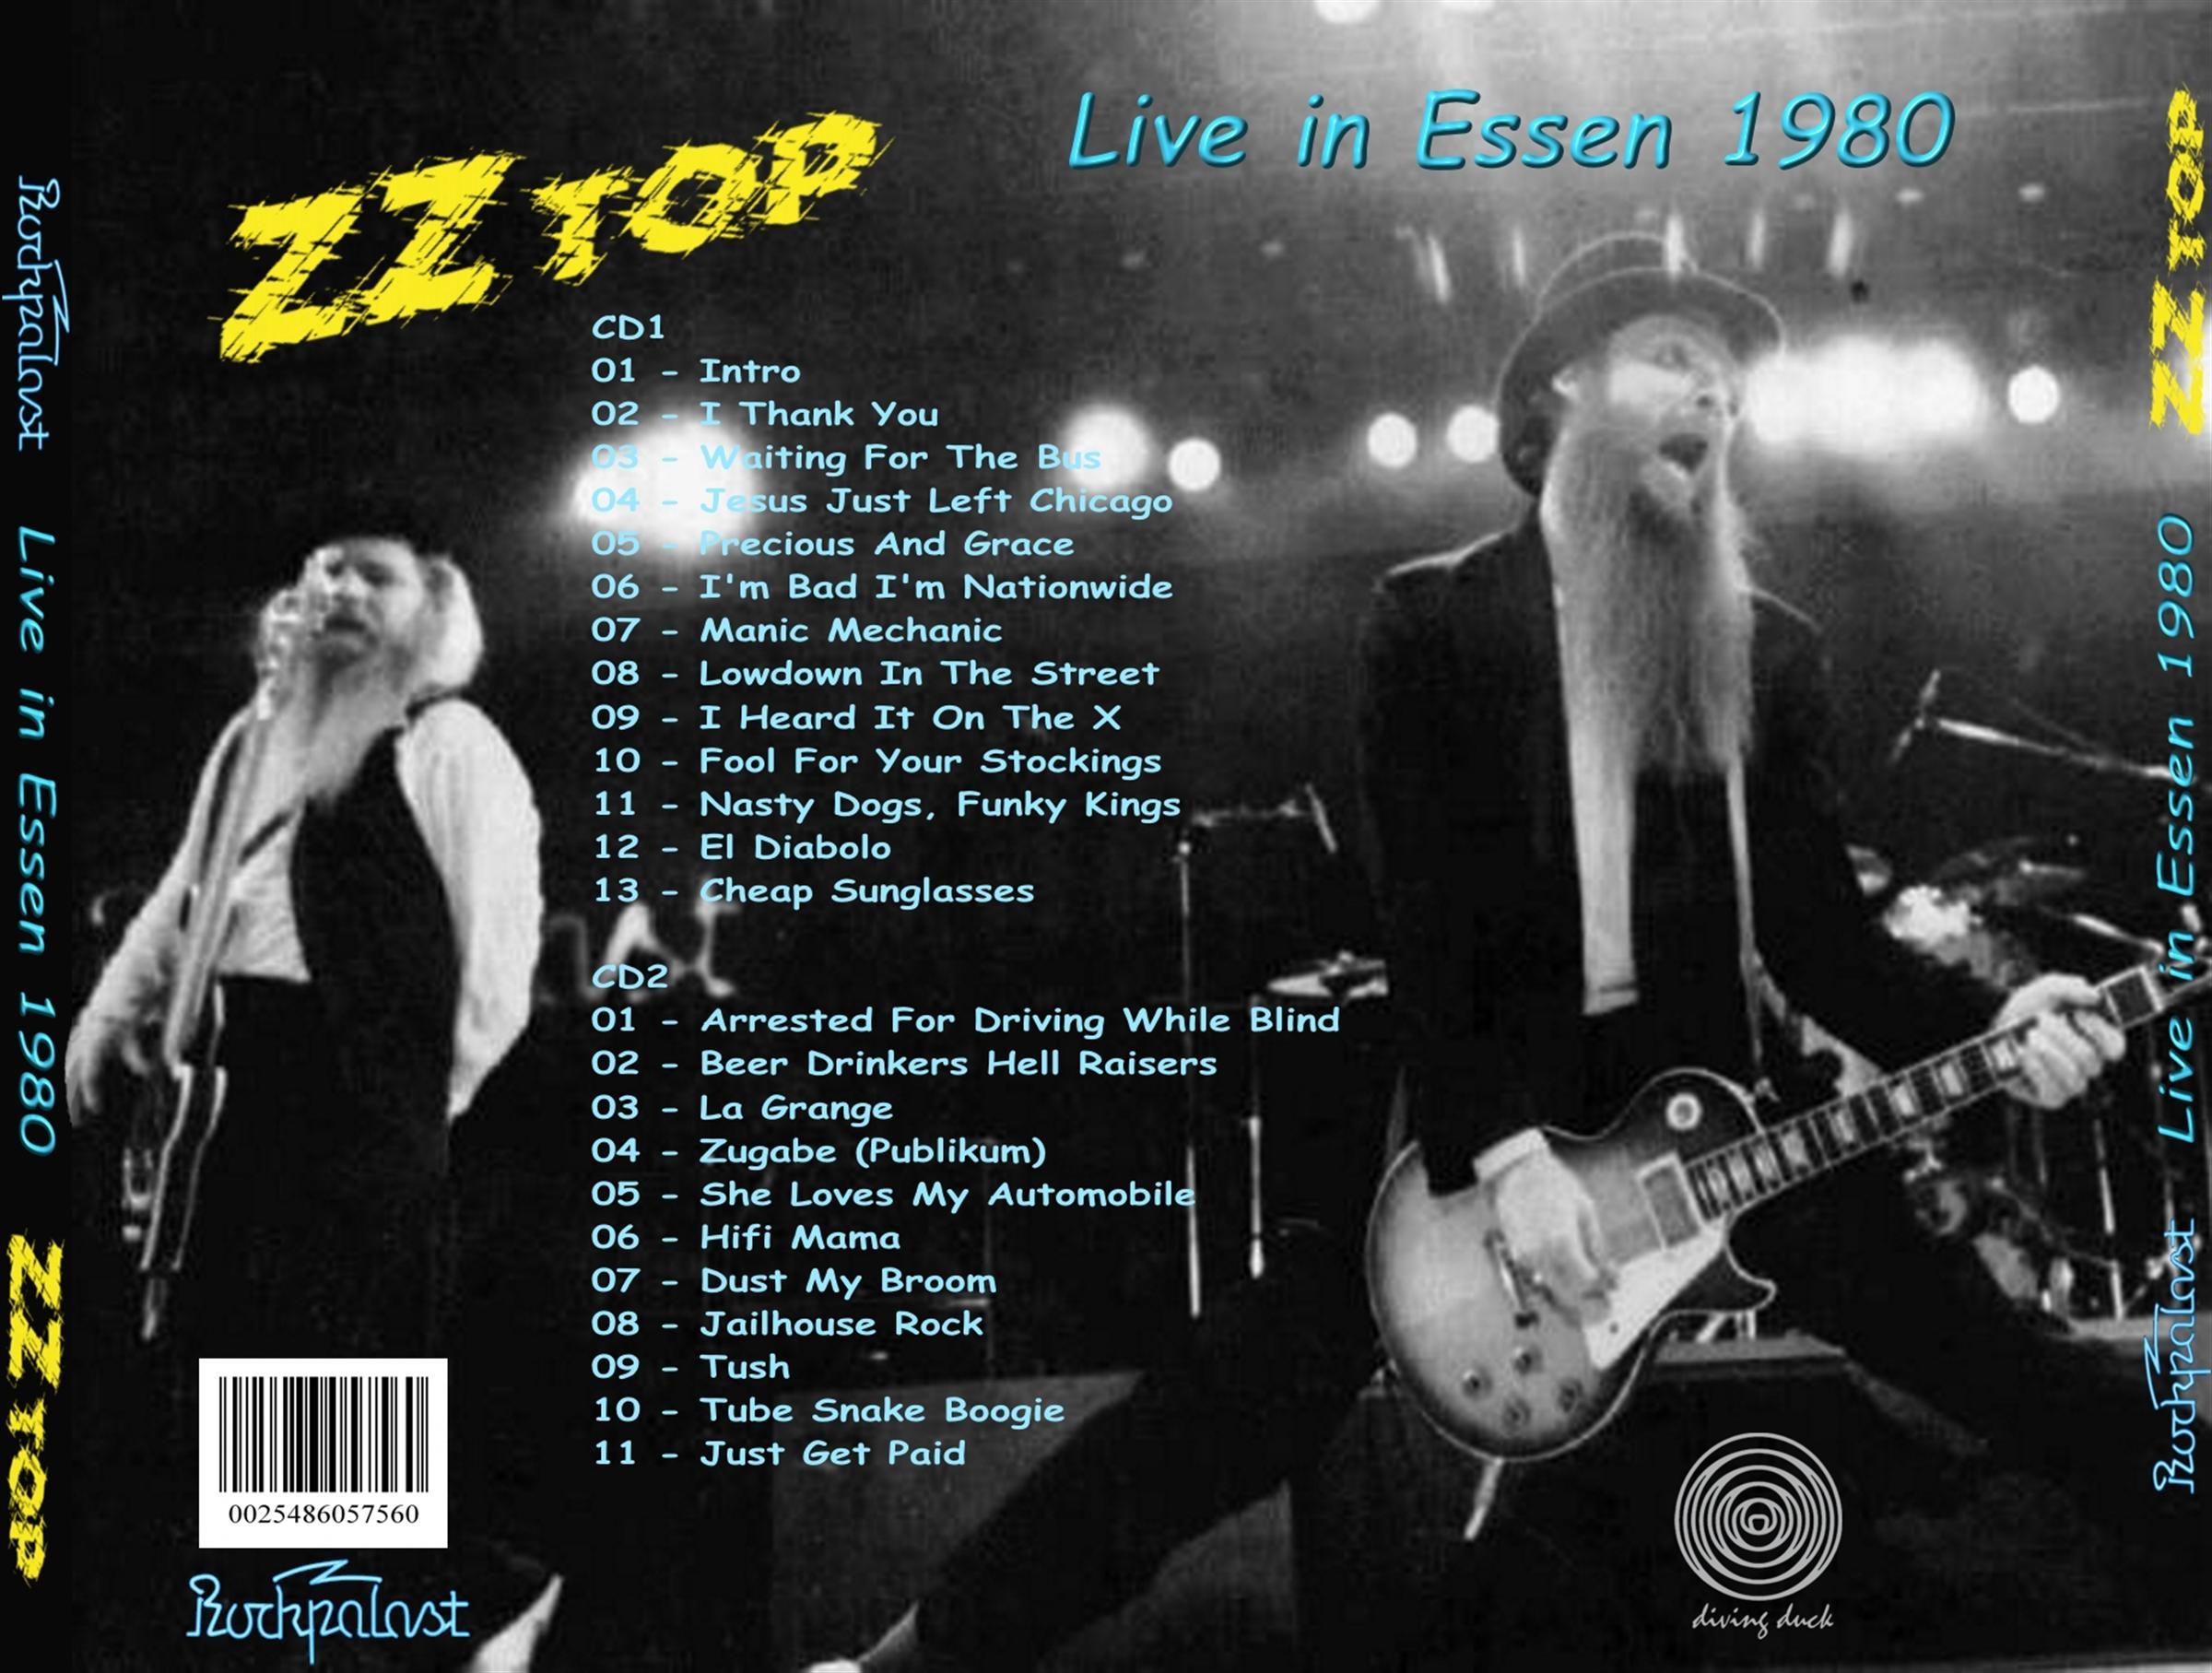 Zz Top Rockpalast